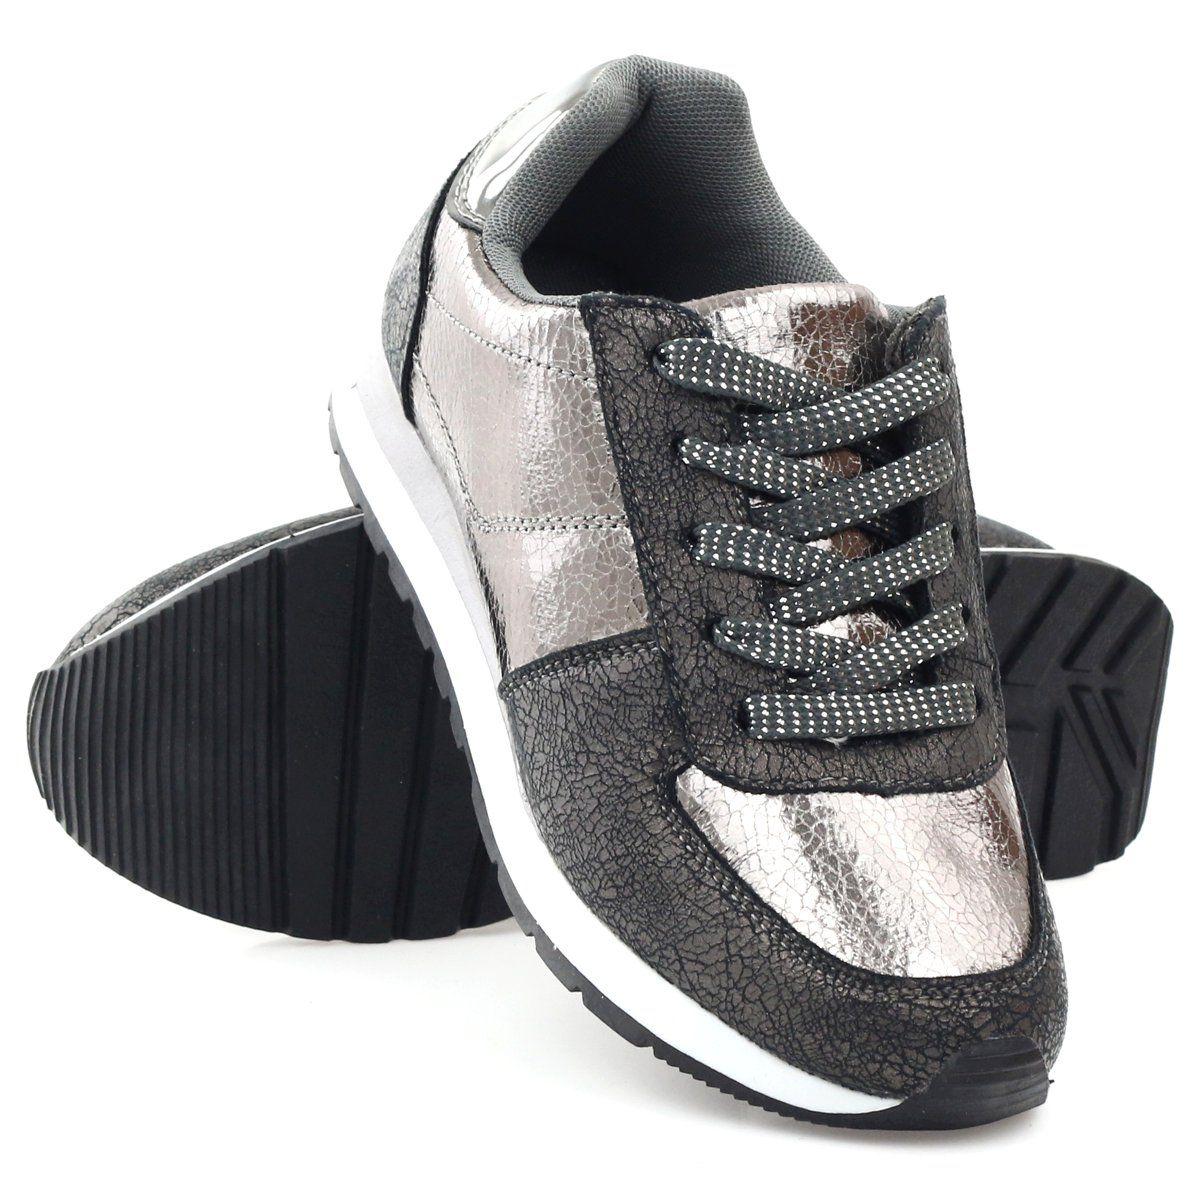 Mcarthur Buty Sportowe Miedziane Szare Sports Shoes Shoes Shoe Inserts